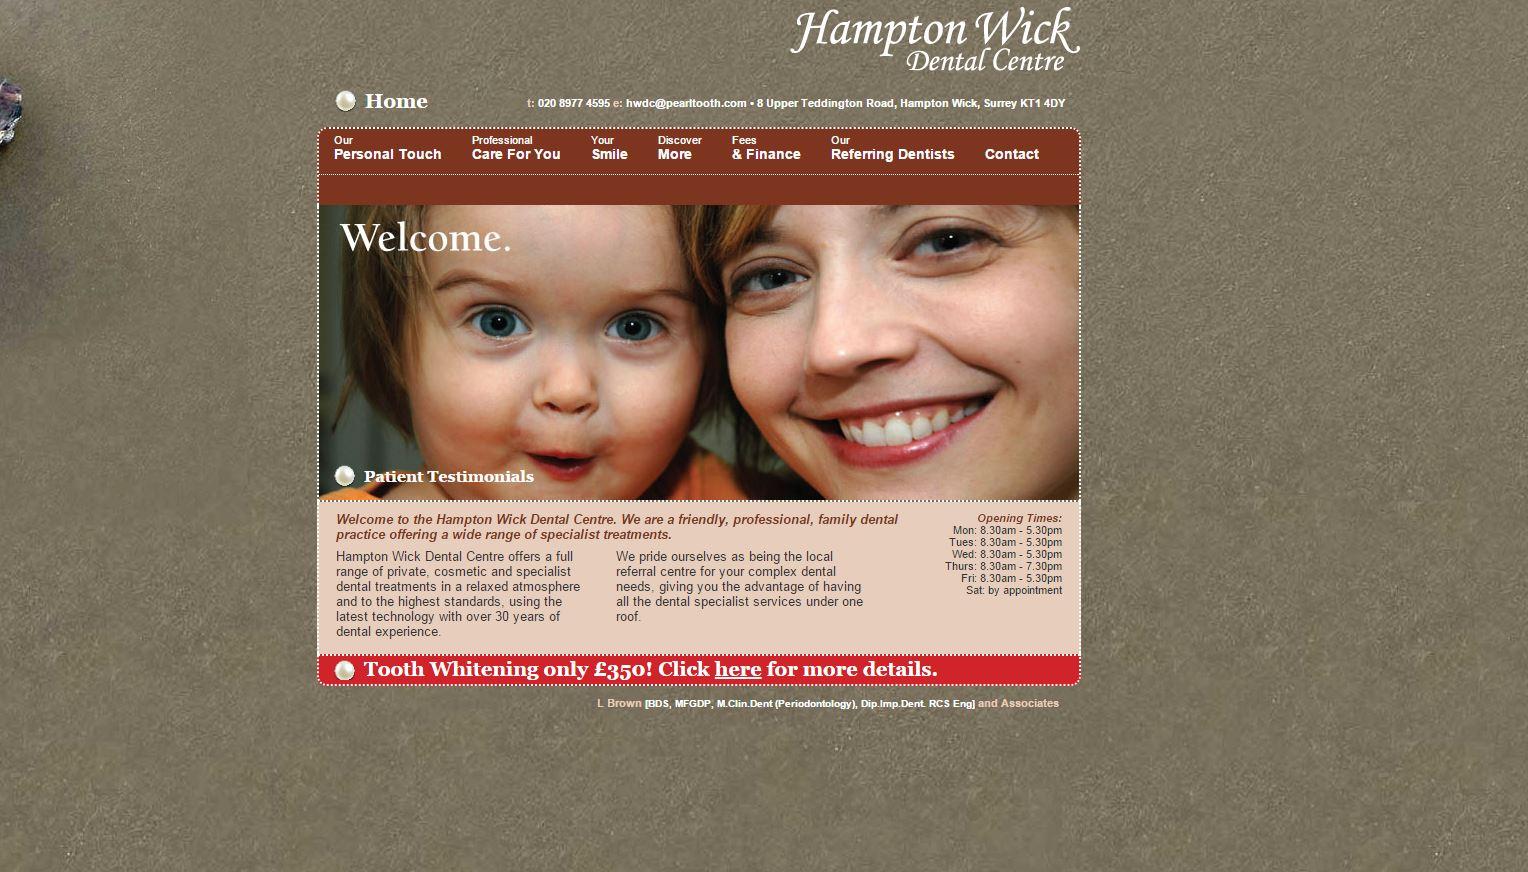 Hampton Wick Dental Centre Homepage Design